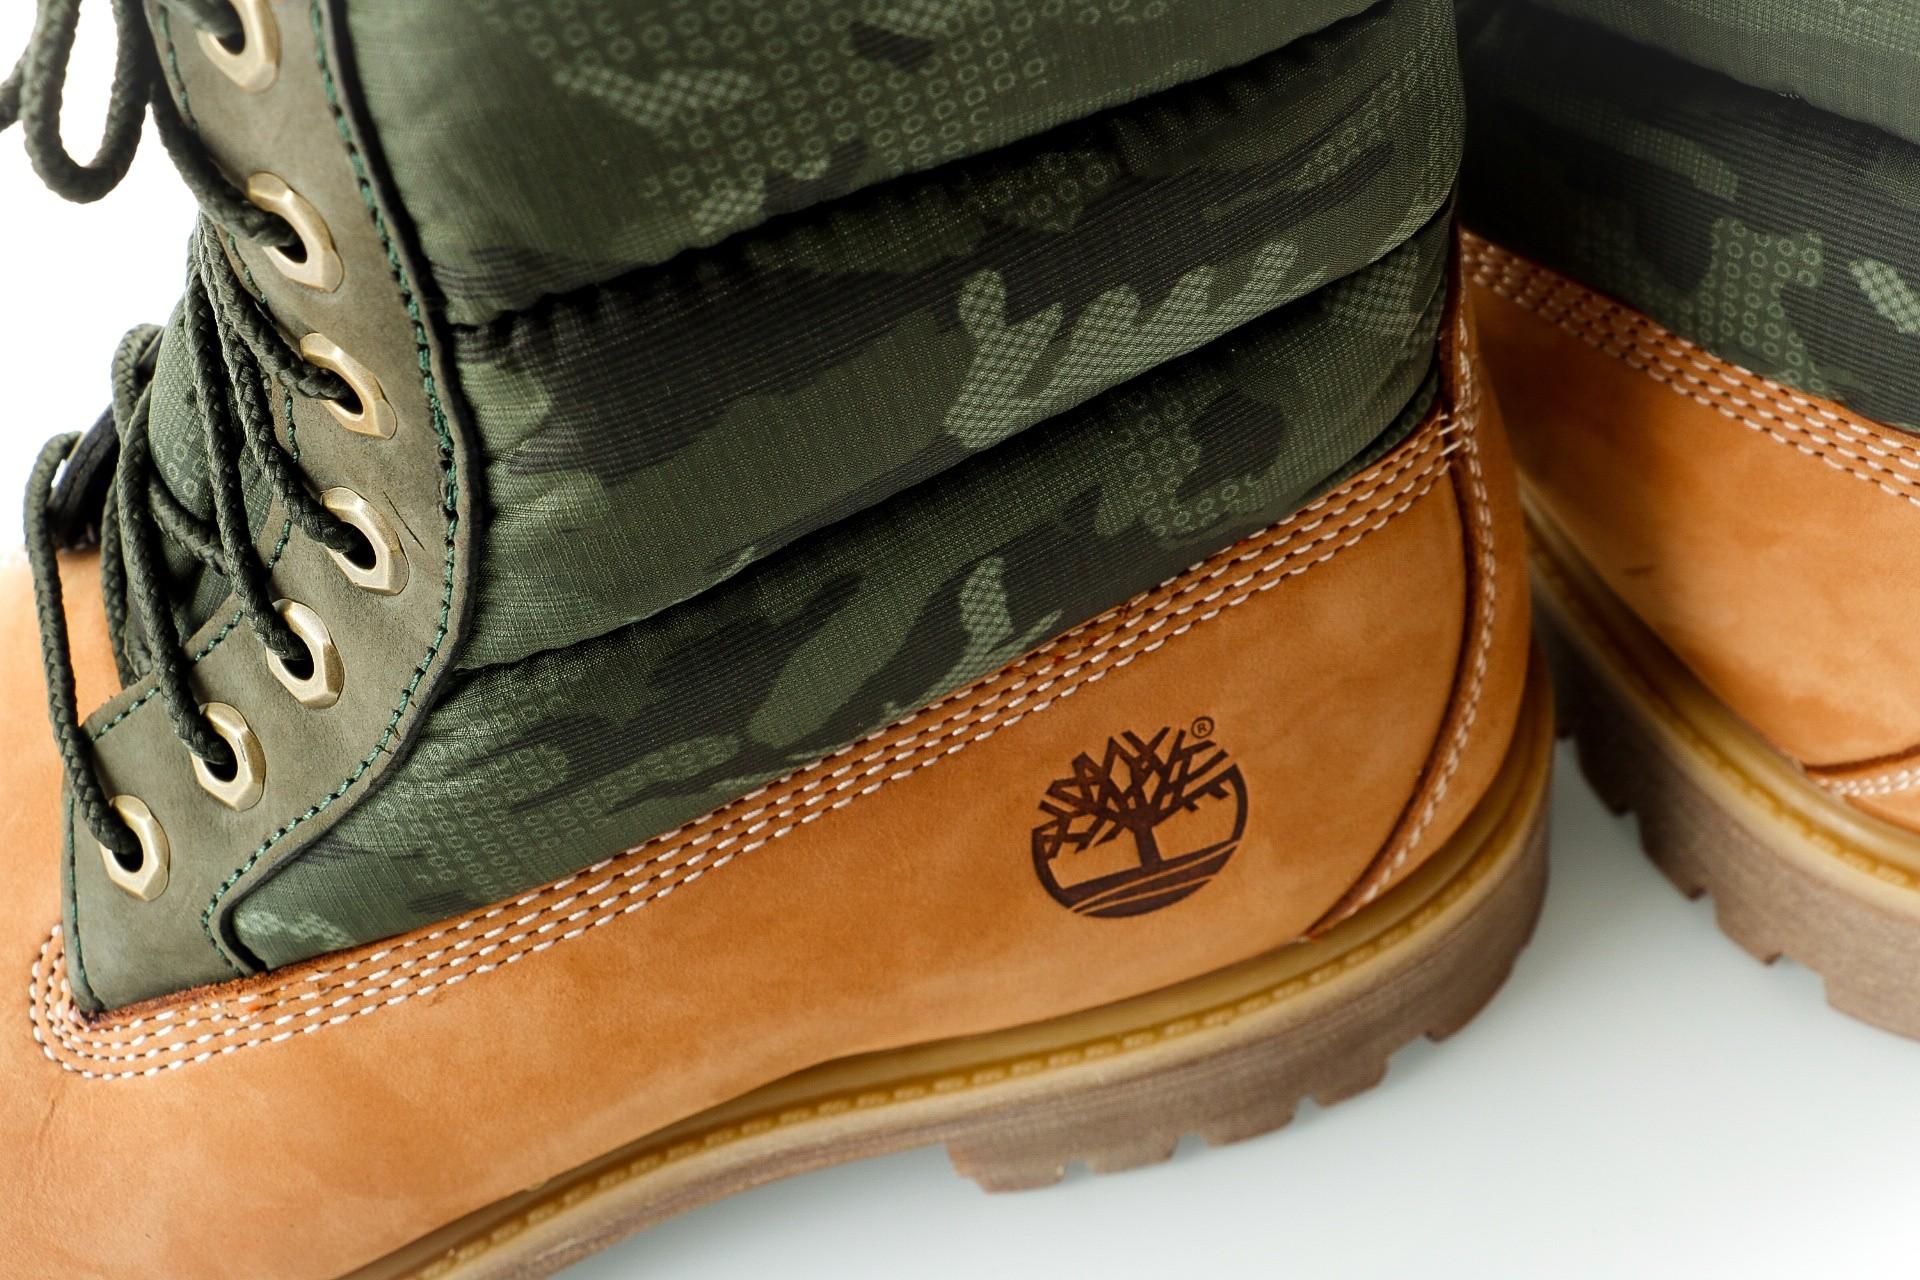 014b21170d0 Wheat Timberland Inch Afbeelding Sneakers TB0A1ZRH2311 van 6 Puffer ...